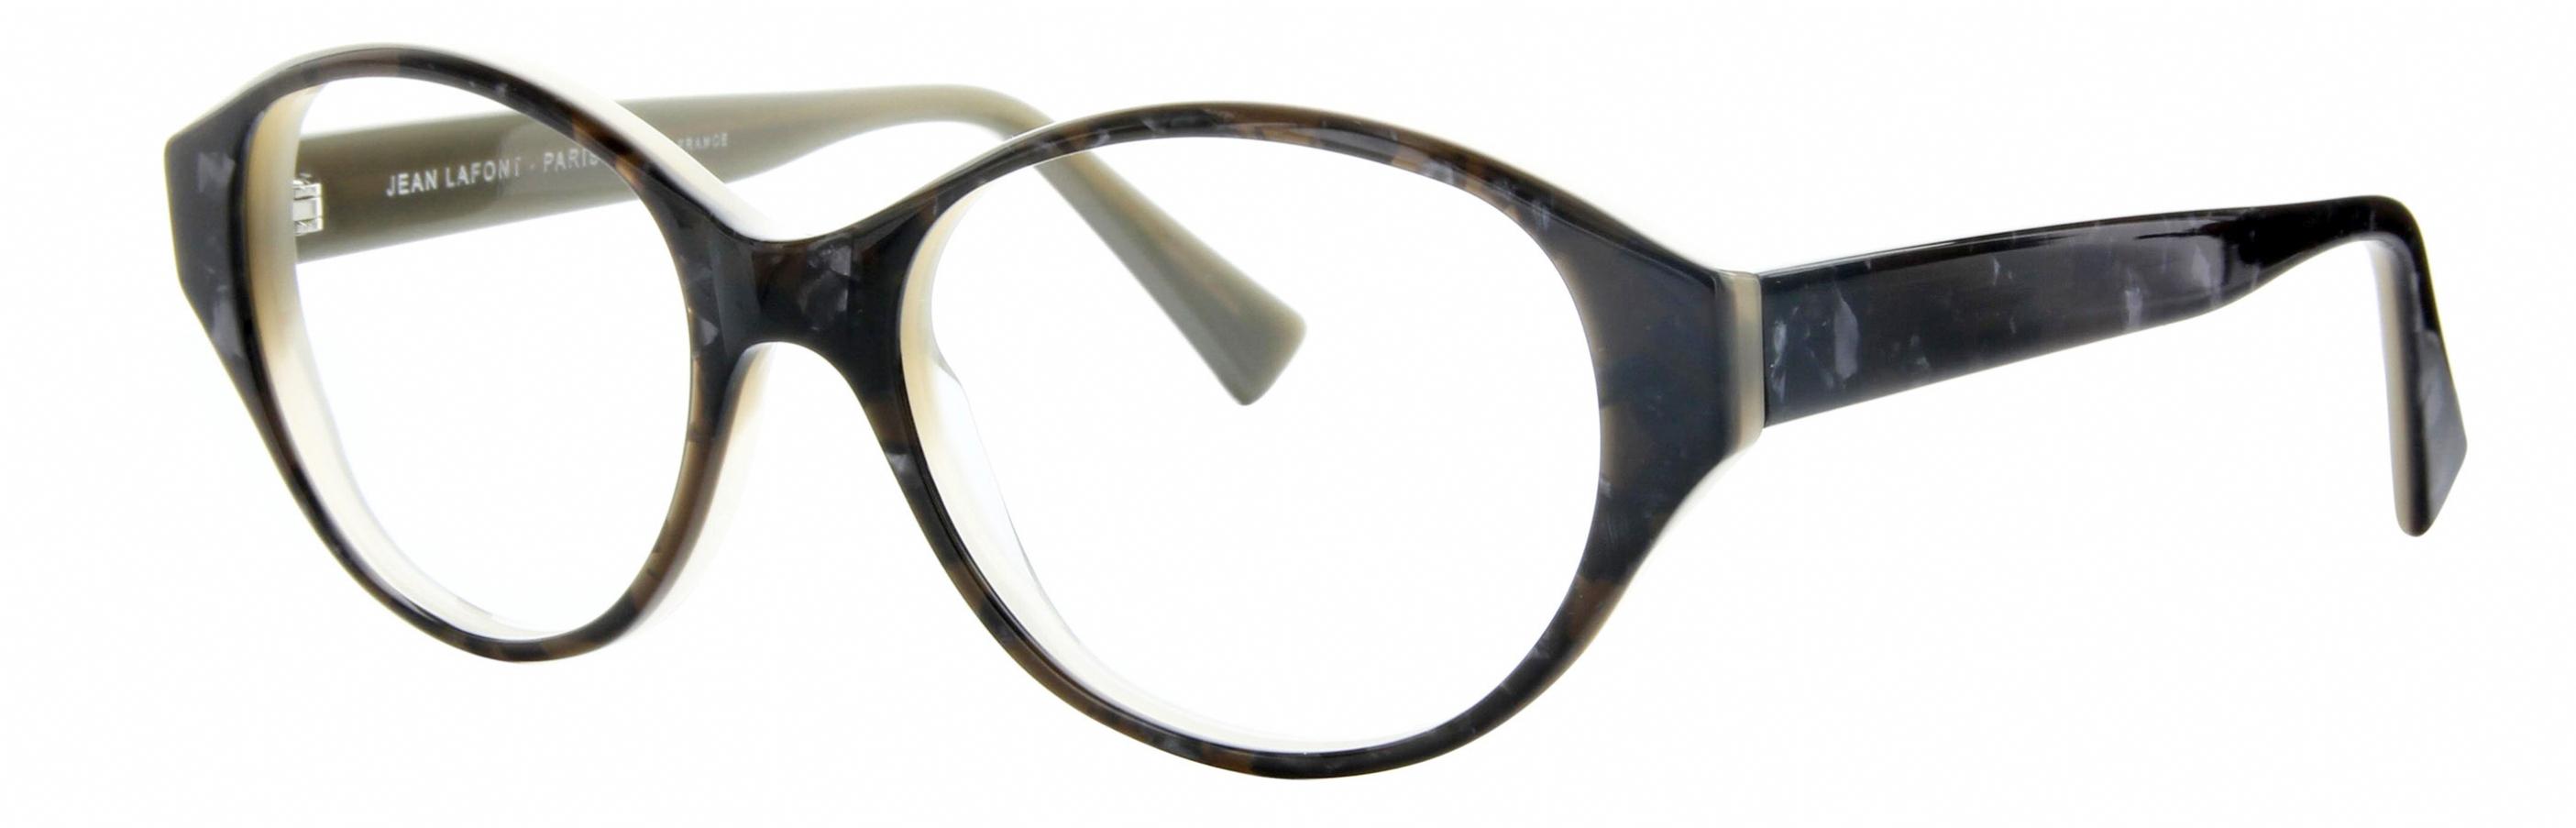 8a029c50892 Lafont Onde Eyeglasses